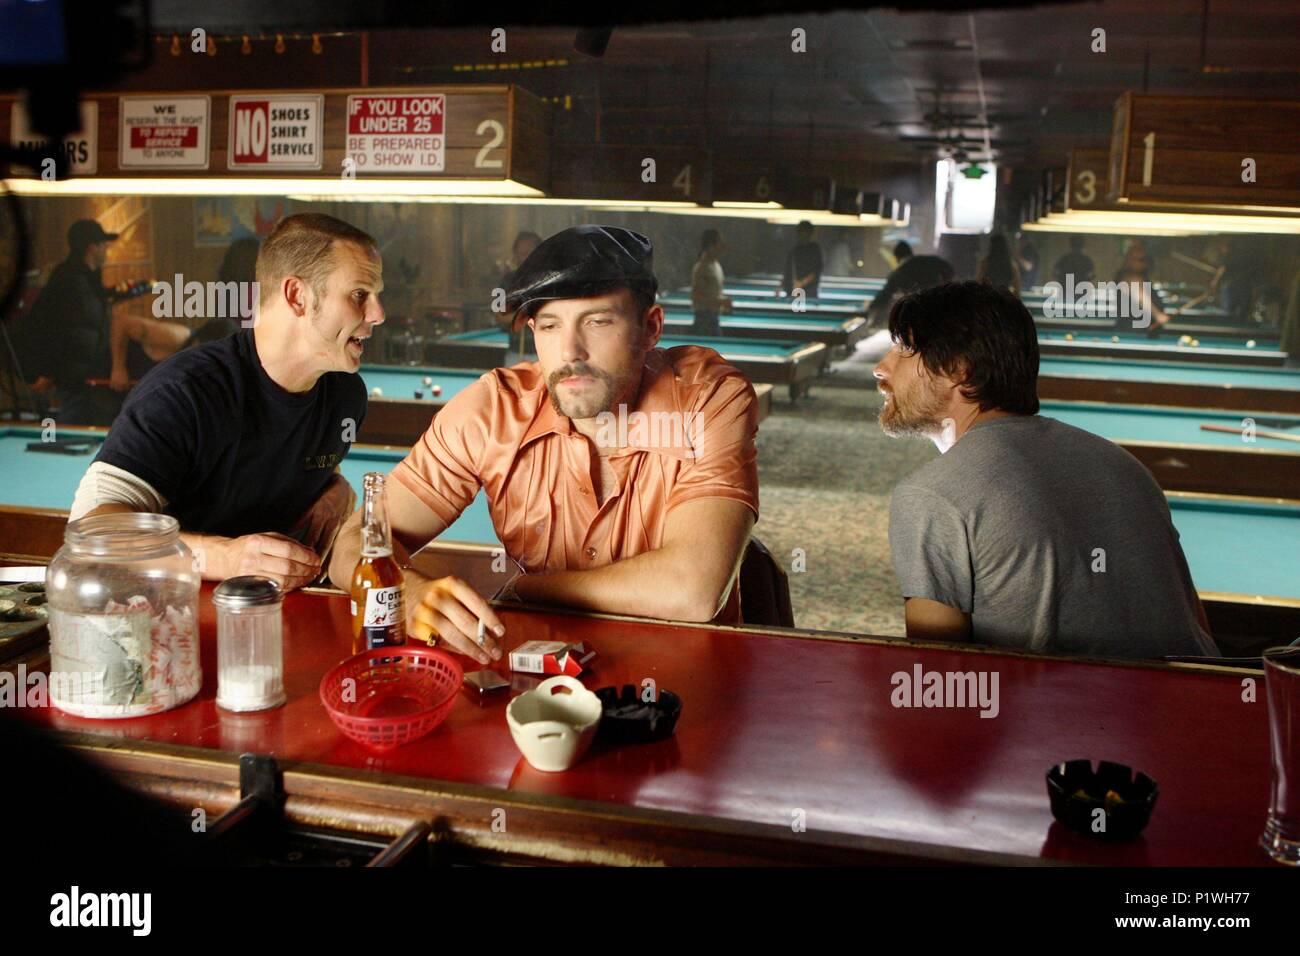 Original Film Title: SMOKIN' ACES.  English Title: SMOKIN' ACES.  Film Director: JOE CARNAHAN.  Year: 2007.  Stars: BEN AFFLECK; PETER BERG; MARTIN HENDERSON. Credit: WORKING TITLE FILMS/RELATIVITY MEDIA/SCION FILMS LIMITED/ / Album - Stock Image